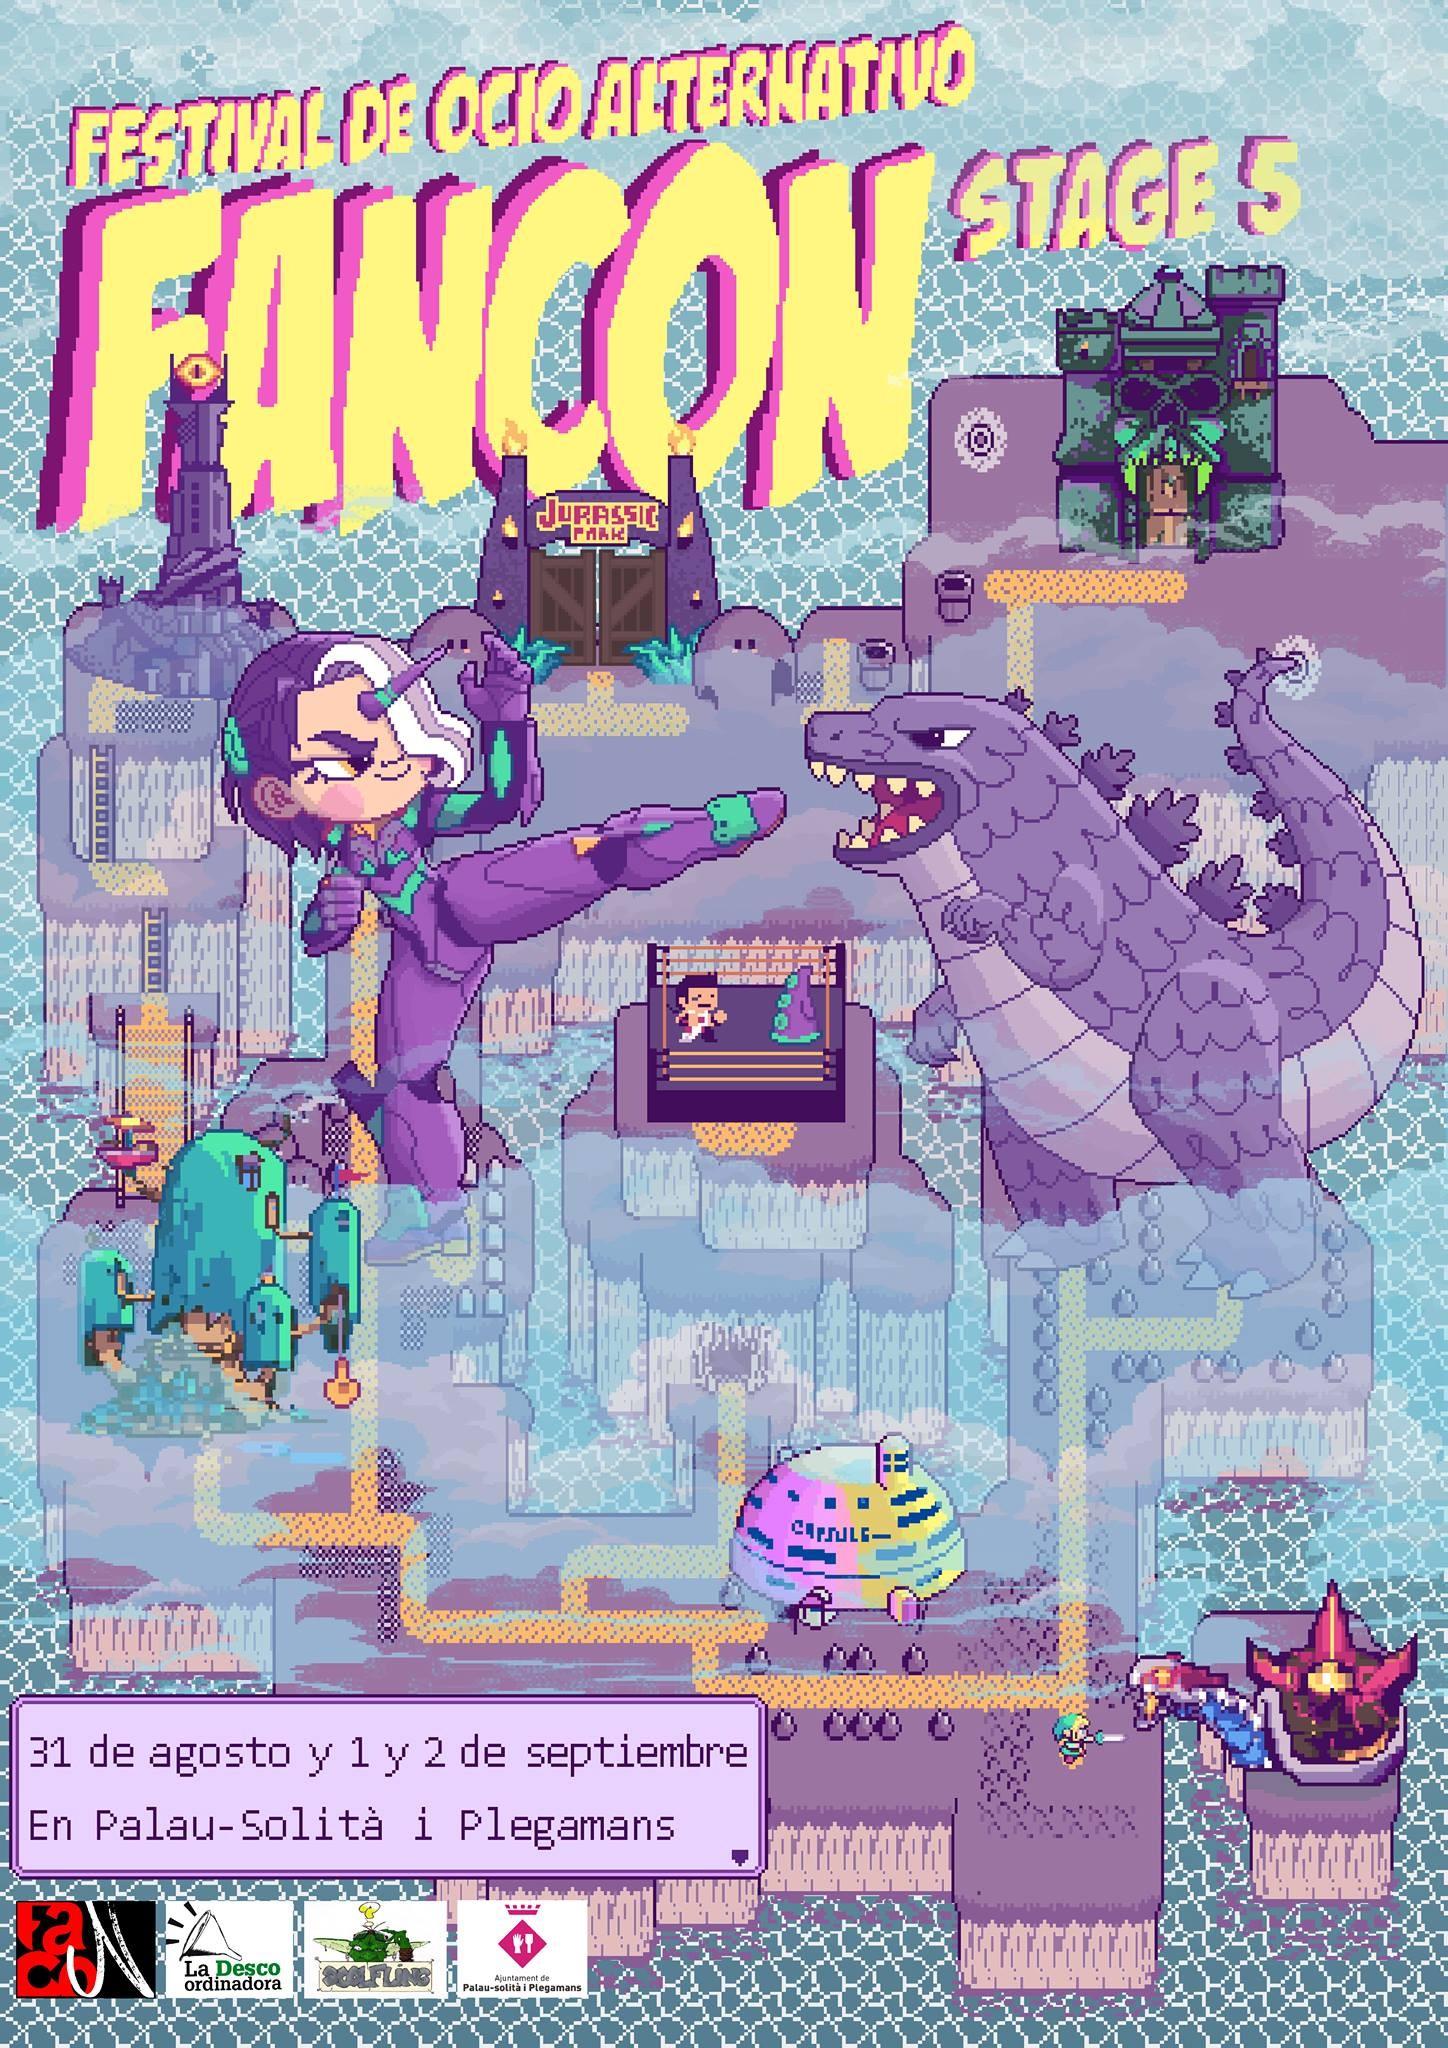 FanConBCN